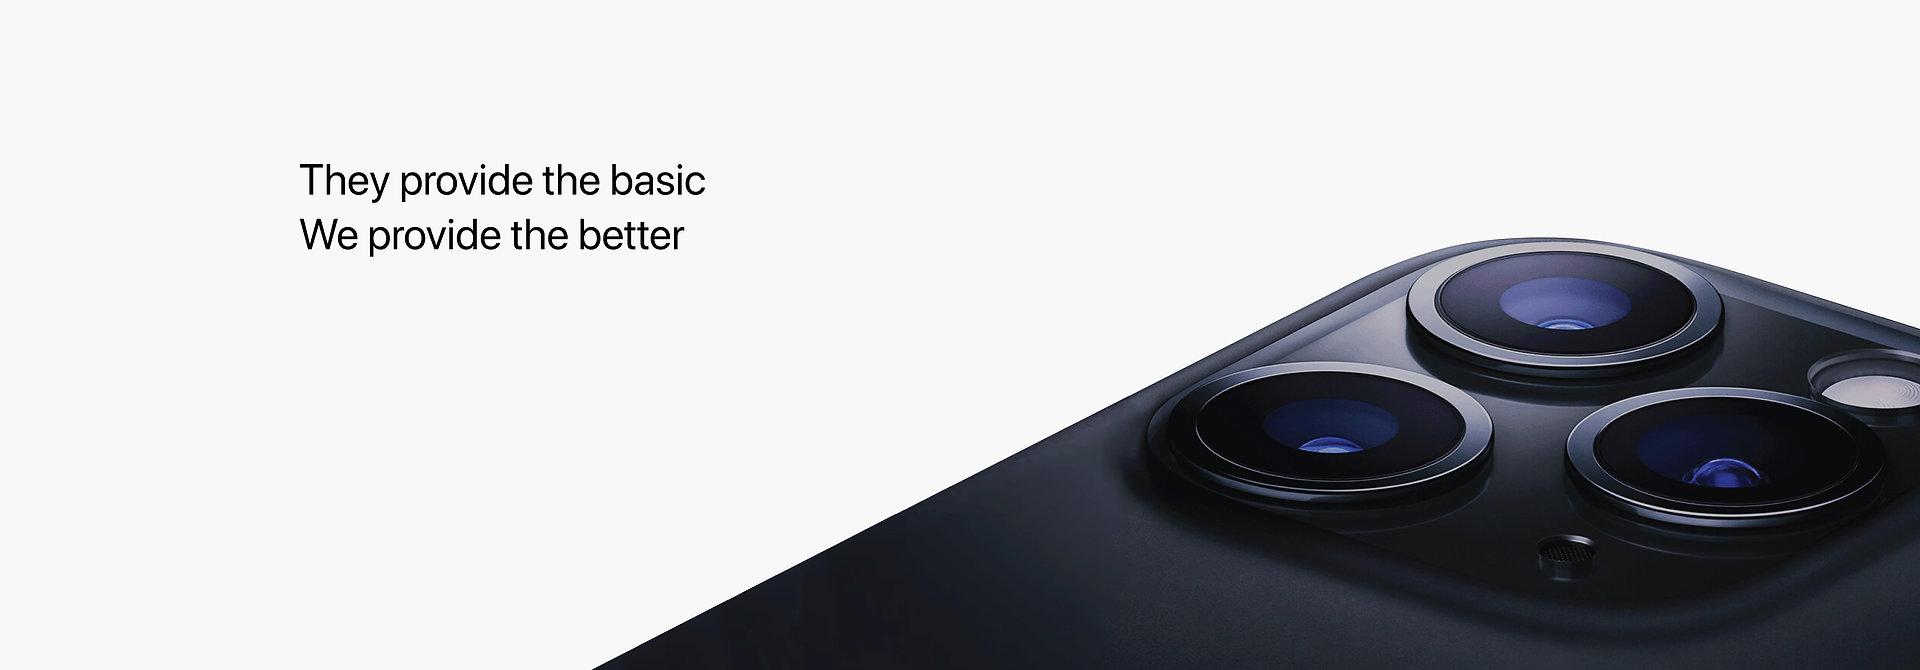 iphone12-opening-banner-1920x670.jpg